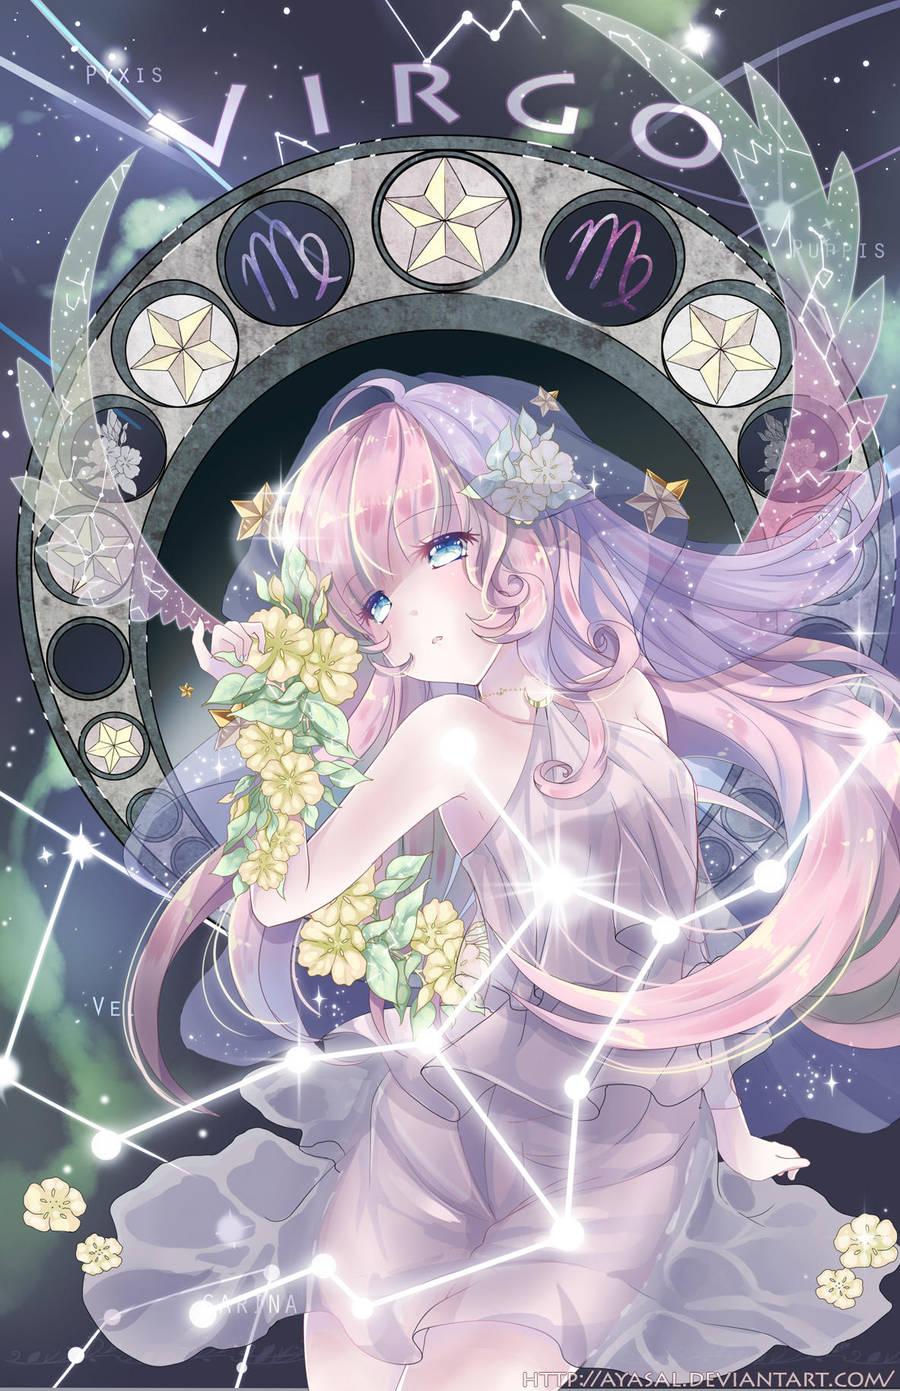 Virgo [Zodiacal Constellations] w. SpeedPaint by Ayasal on ...